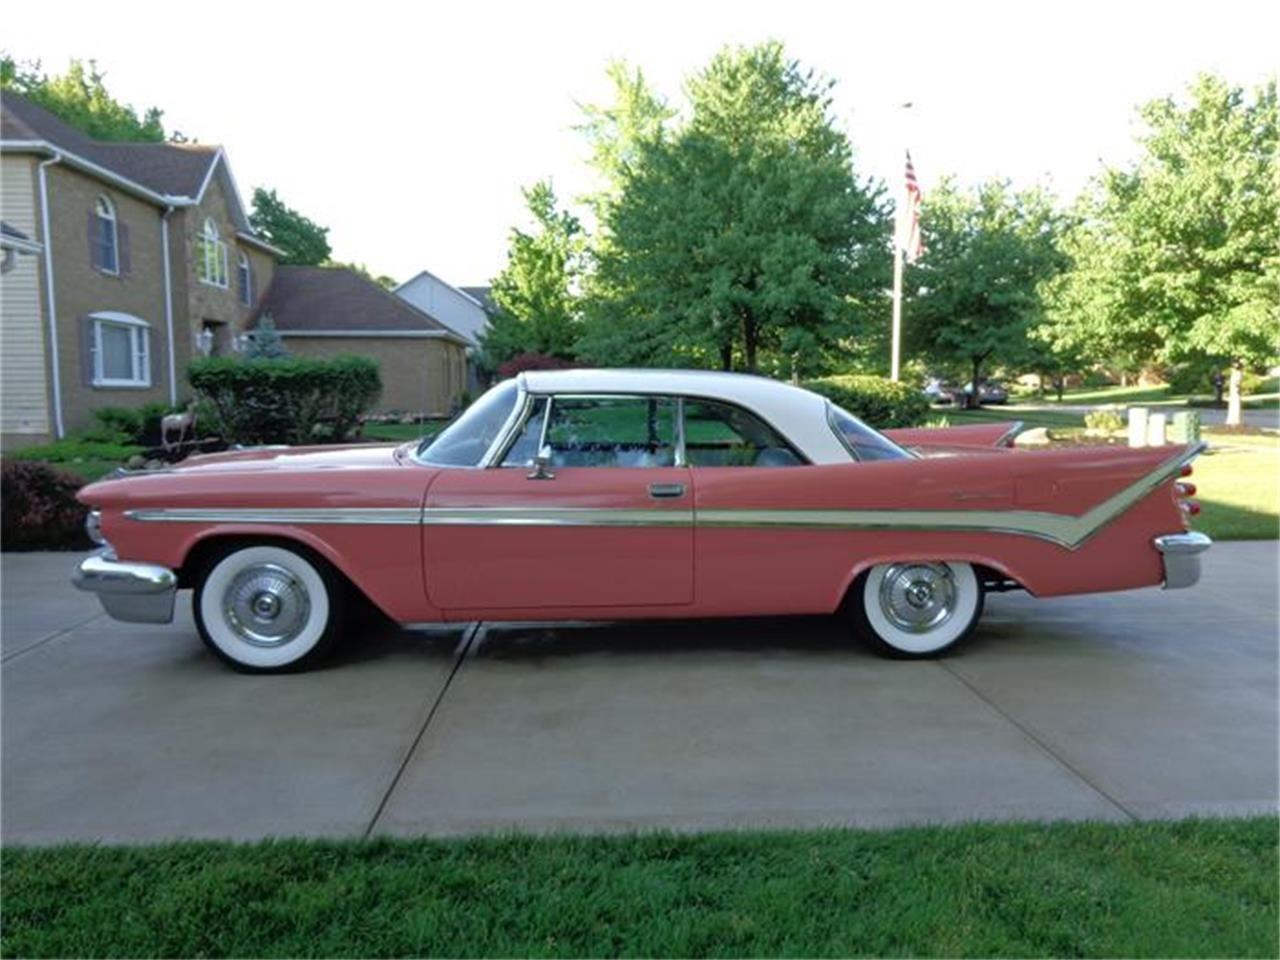 For Sale: 1959 DeSoto Firesweep in North Royalton, Ohio